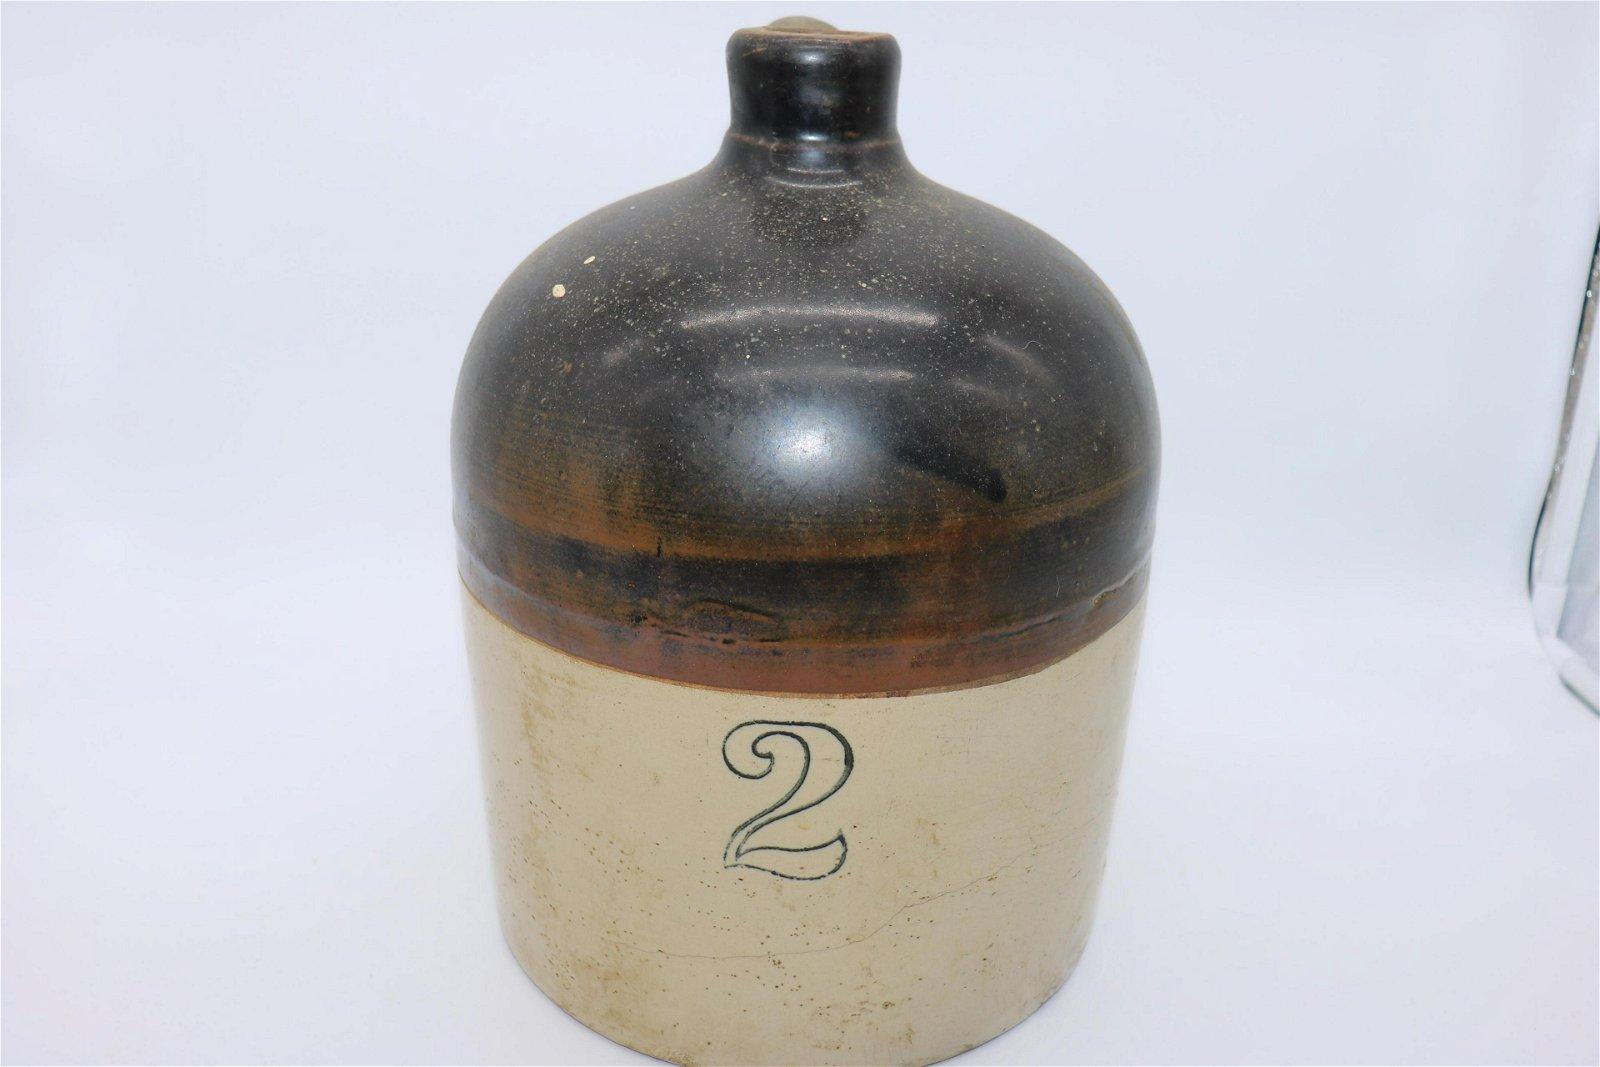 Antique 2-Gallon Stoneware Jug